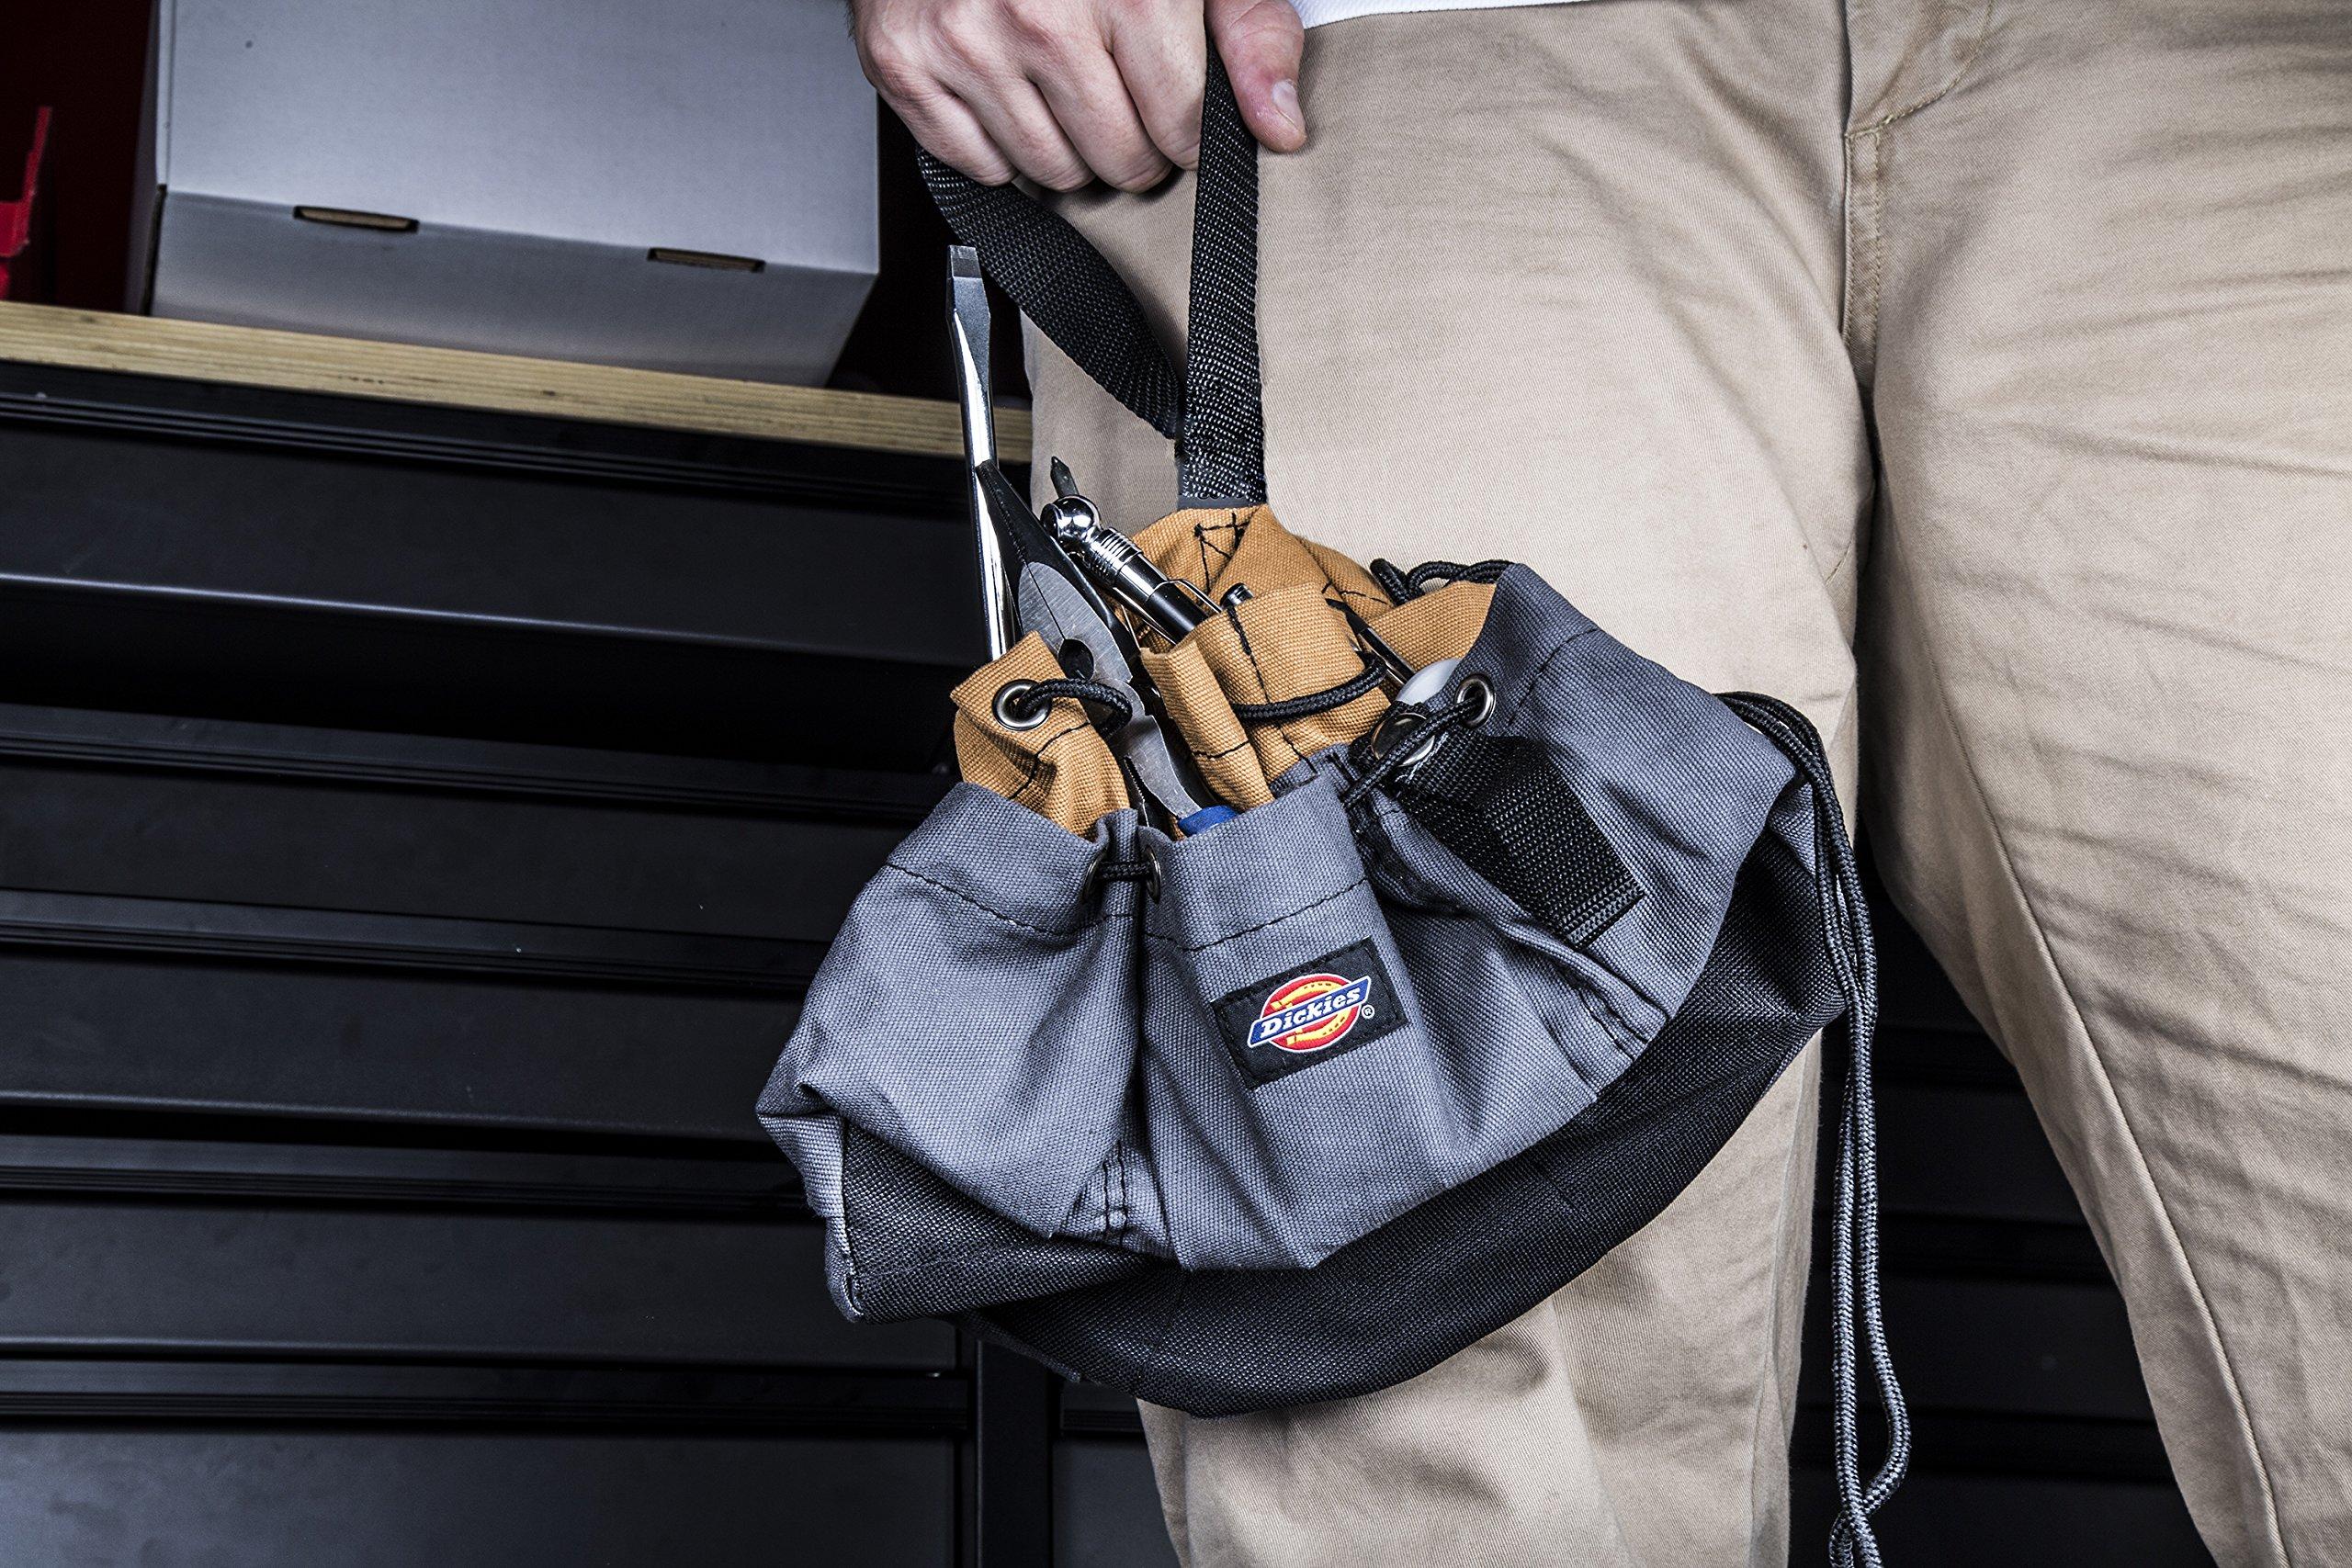 Dickies Work Gear – 12-Pocket Parachute Style Bag – 57004 – Grey/Tan Parachute Work Bag – Tool Bag – Construction – Snap-Secured Tape Strap – 8.8 oz. by Dickies Work Gear (Image #6)